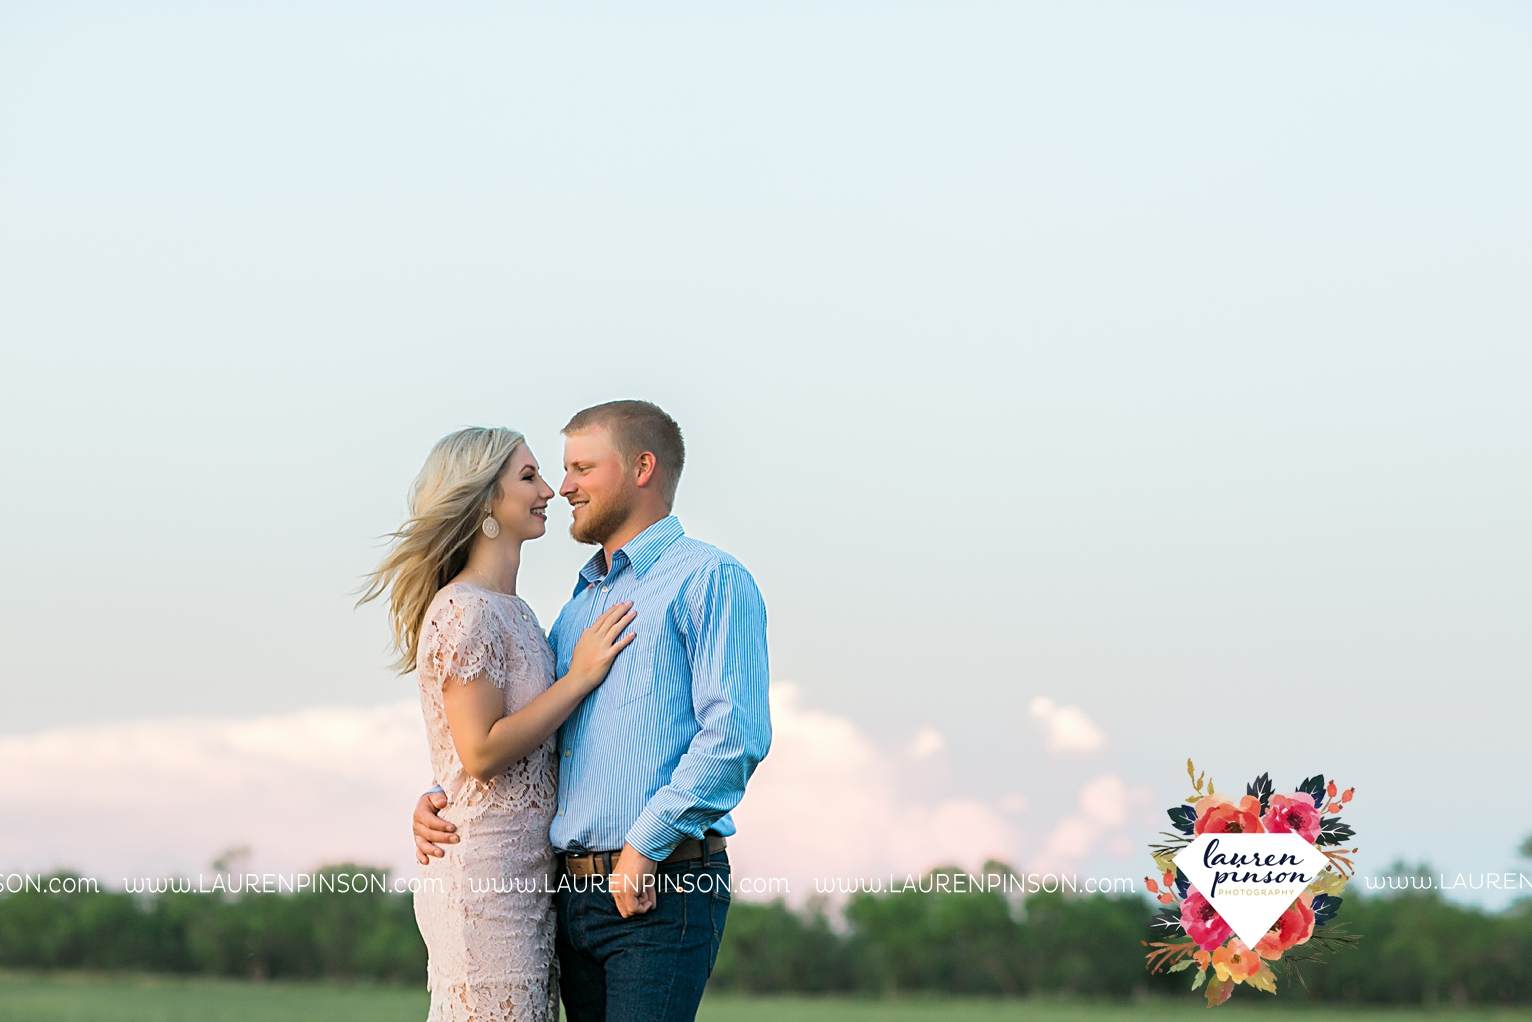 wichita-falls-texas-wedding-photographer-scotland-texas-engagement-session-country-barn-field-windthorst_2774.jpg